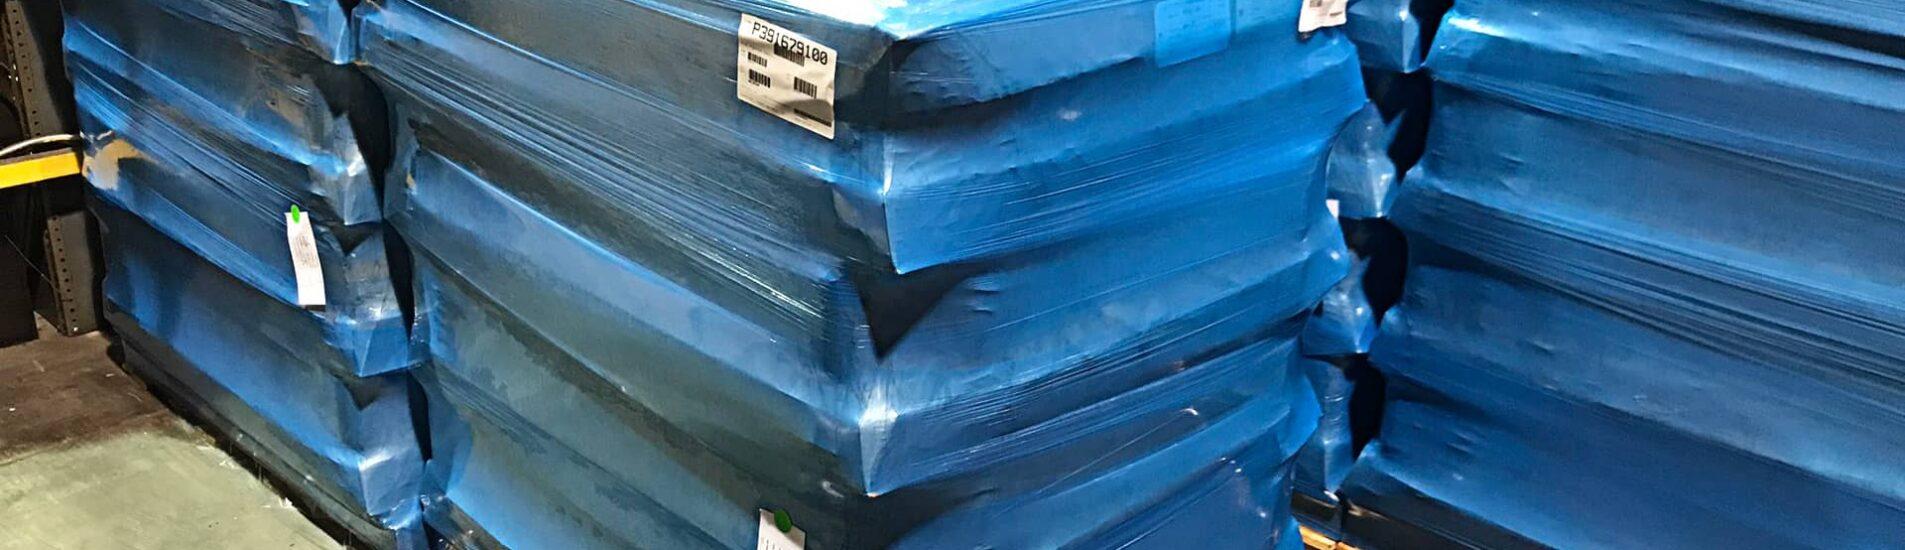 ARMOR POLY Stretch Film wrapped around shipping box